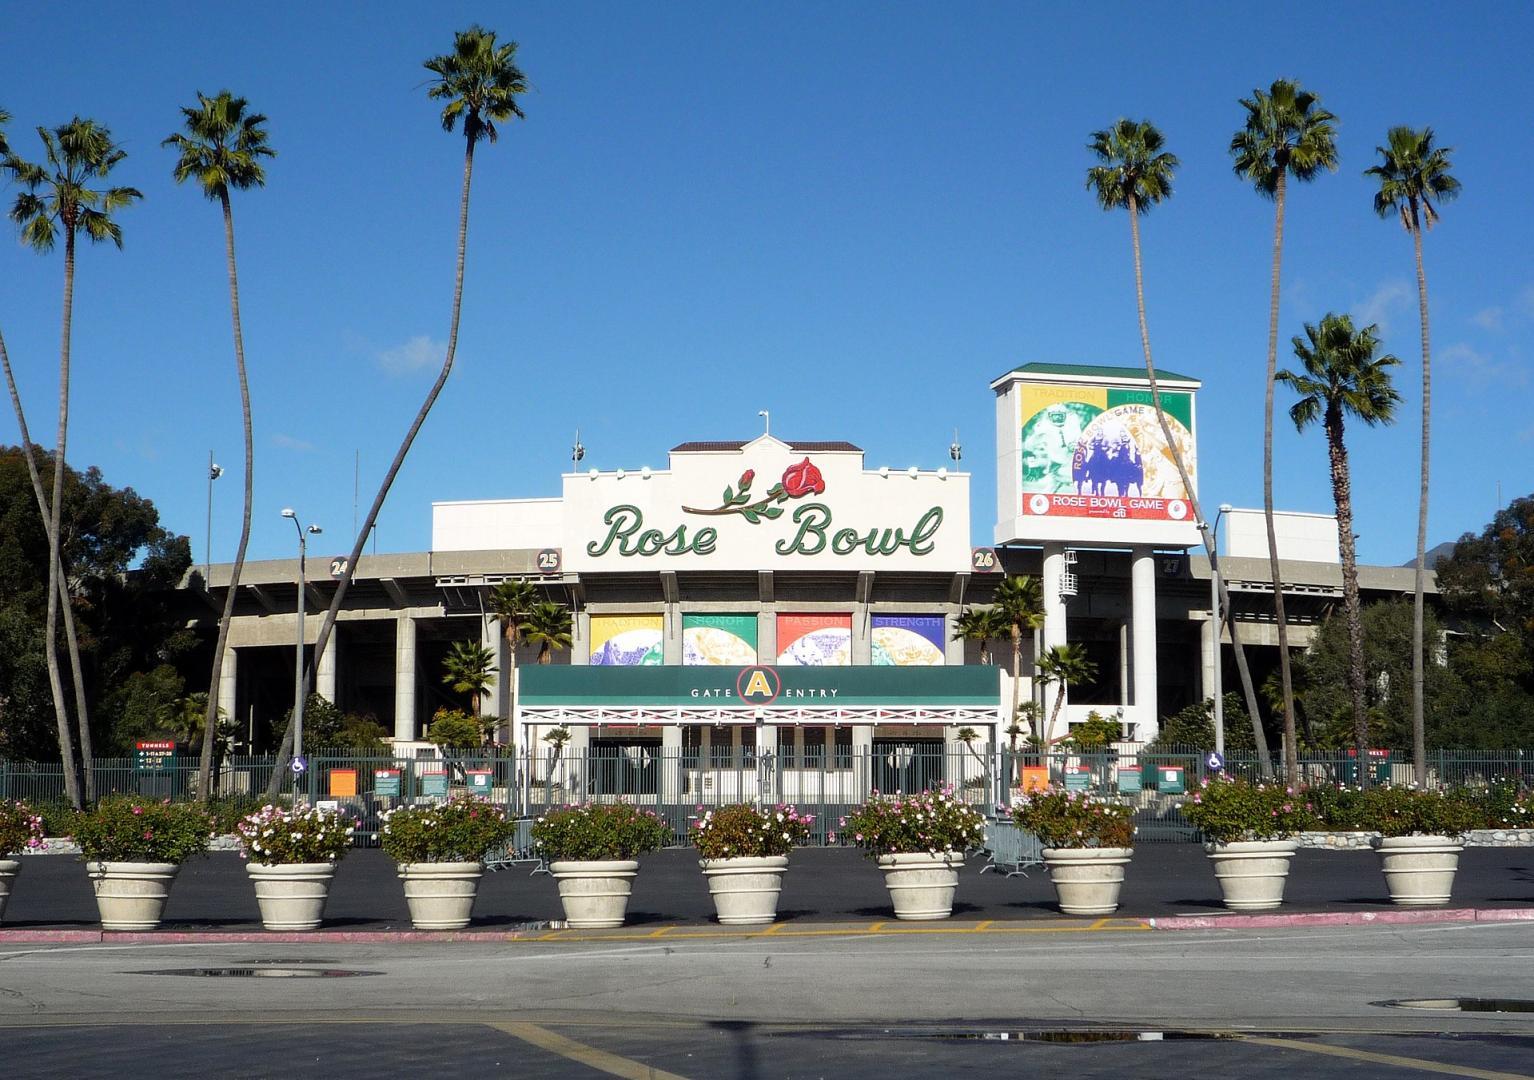 1920px-2008-1226-Pasadena-008-RoseBowl